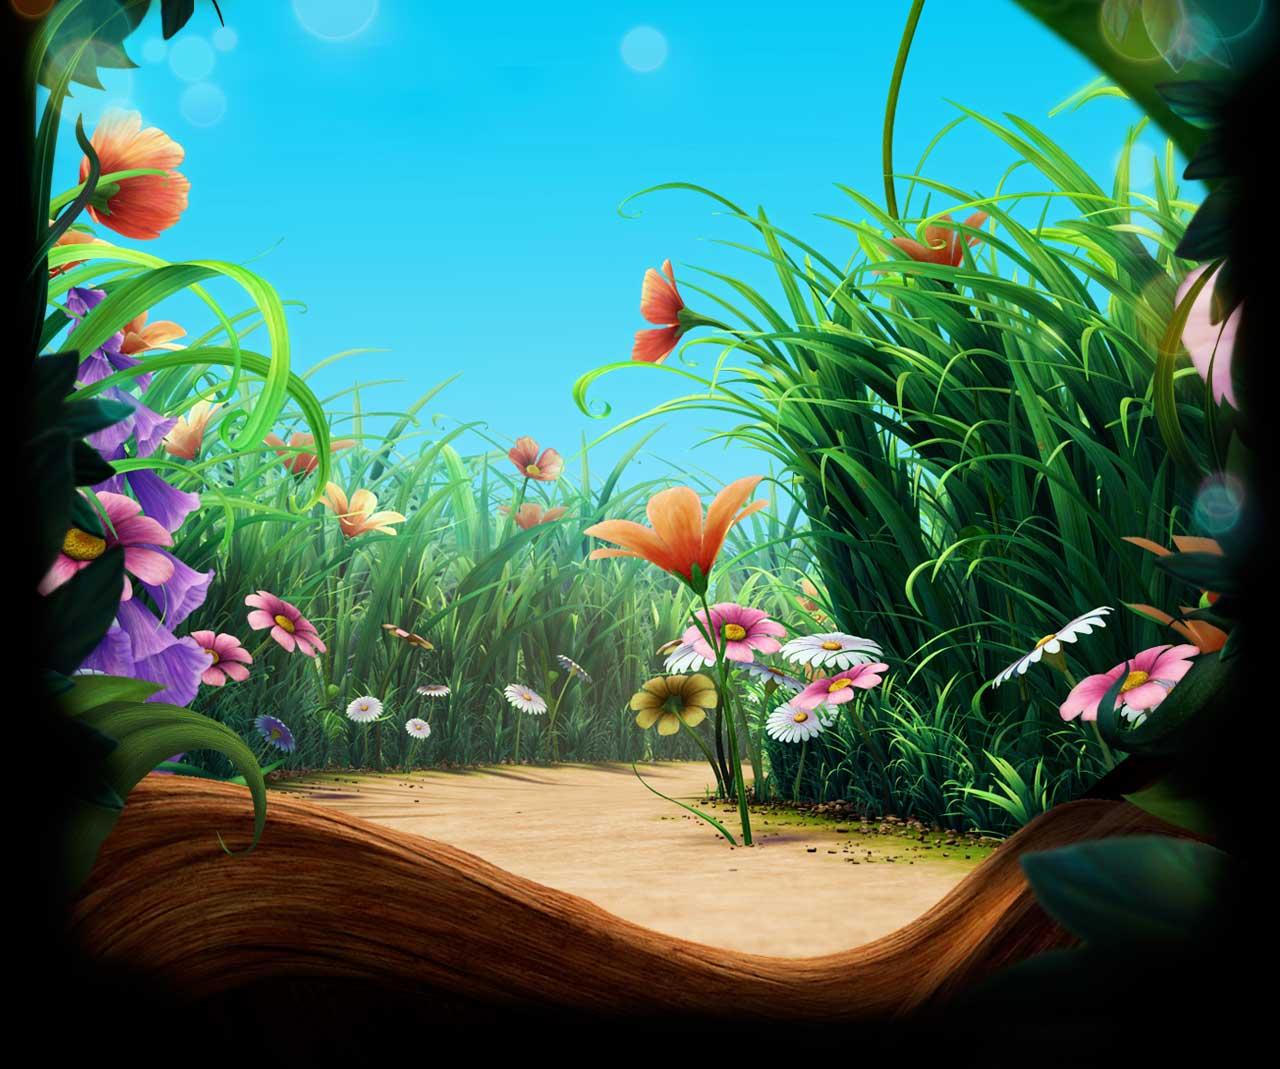 fairy garden white wallpaper - photo #29